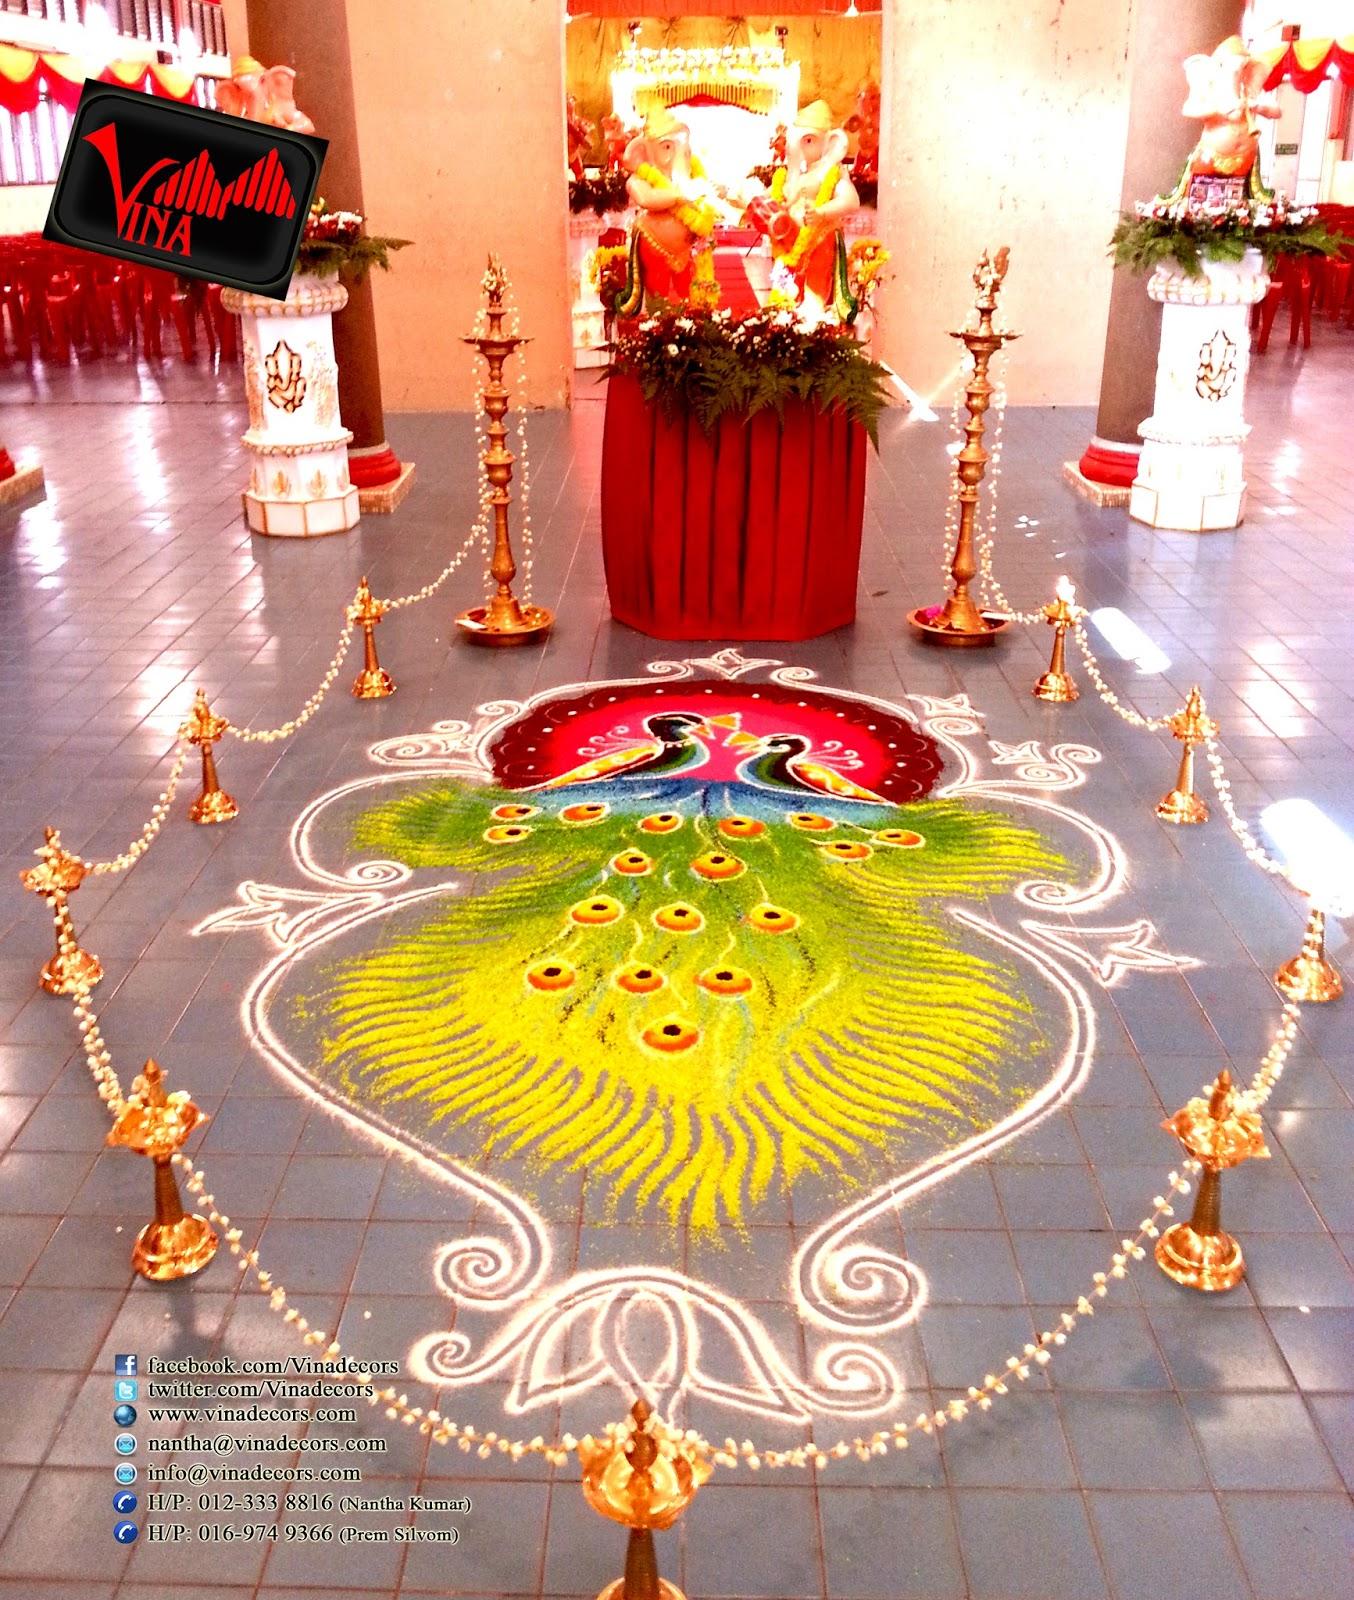 Wedding Kolam Images: Vina Canopy & Decor: COLLECTION OF RANGOLI KOLAM BY VINA